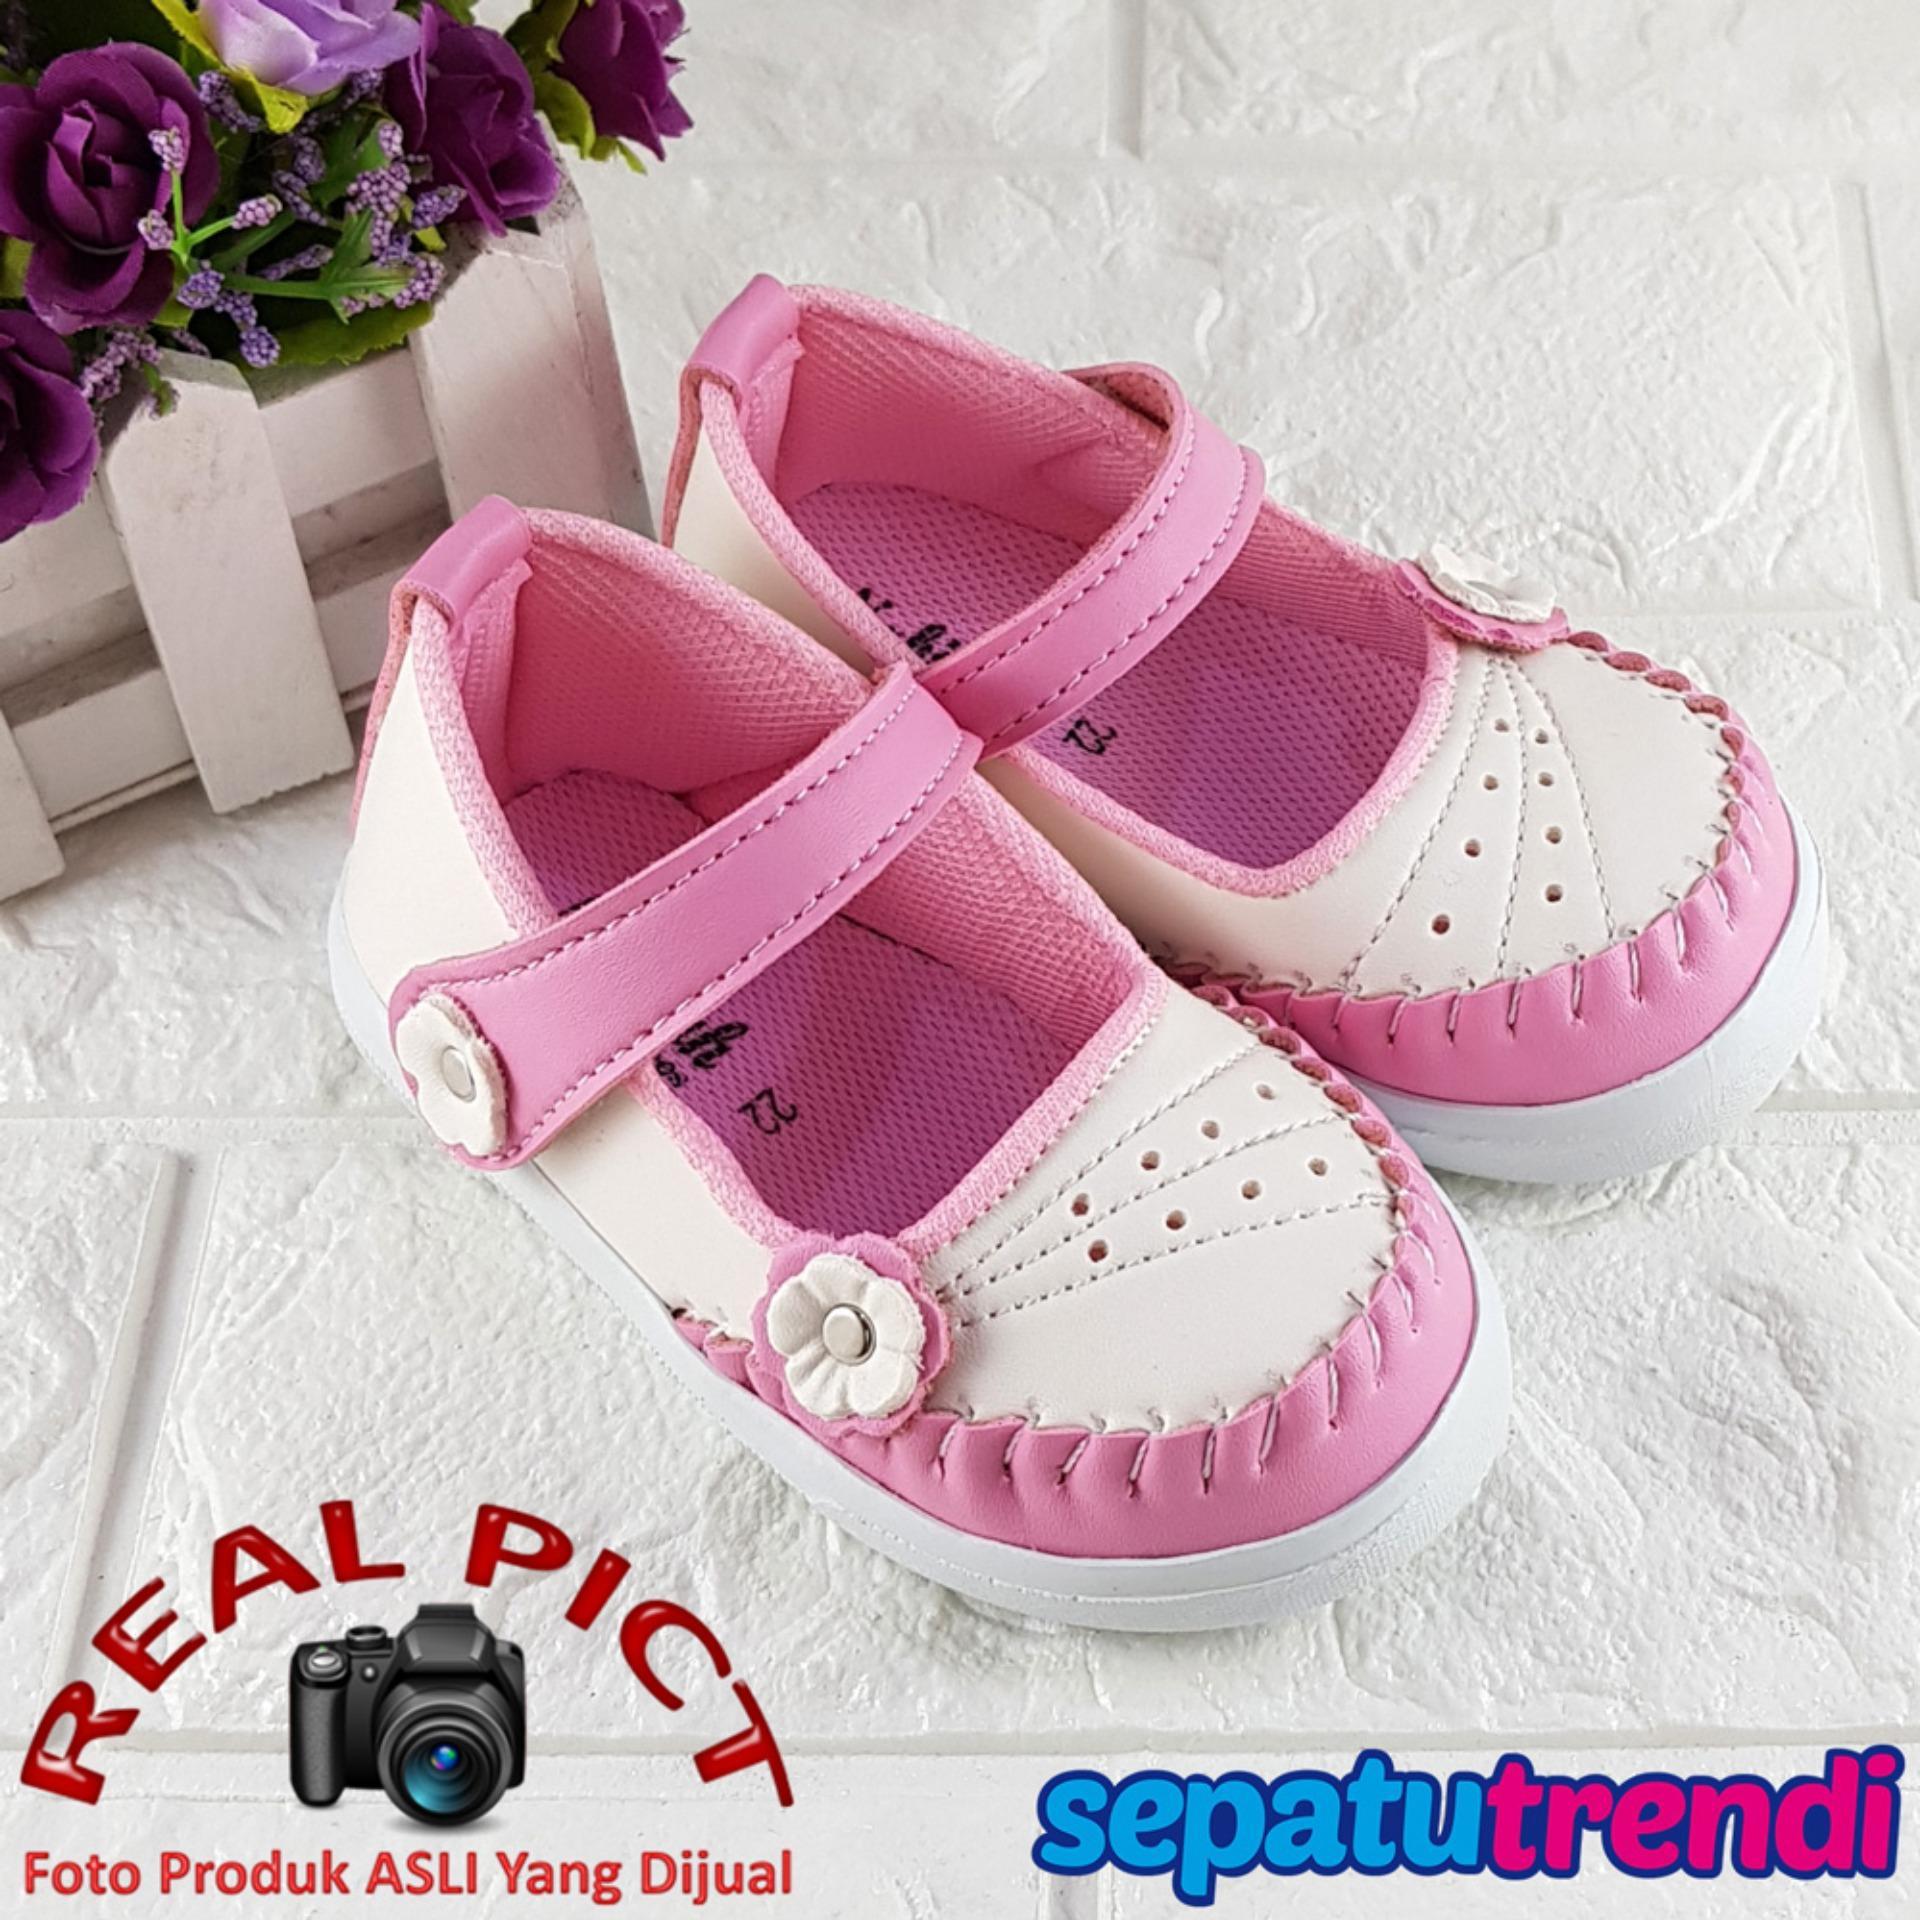 Lunetta Sepatu Anak Bayi Perempuan Bunga Rajut Cantik RJTBGA